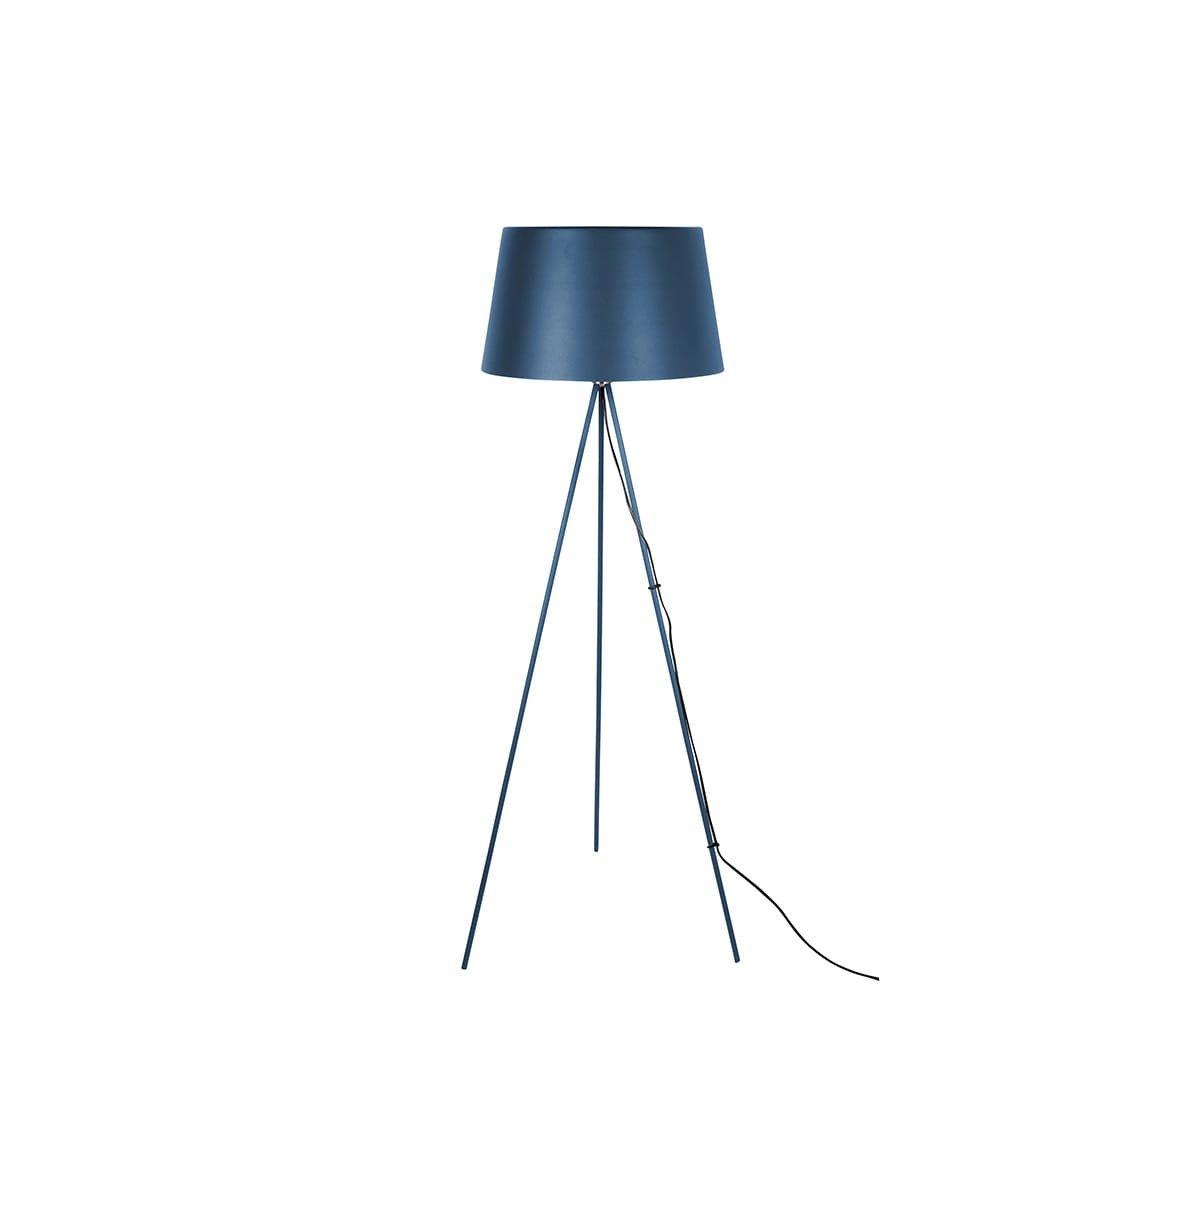 Stojací lampa Classy Metal – tmavě modrá